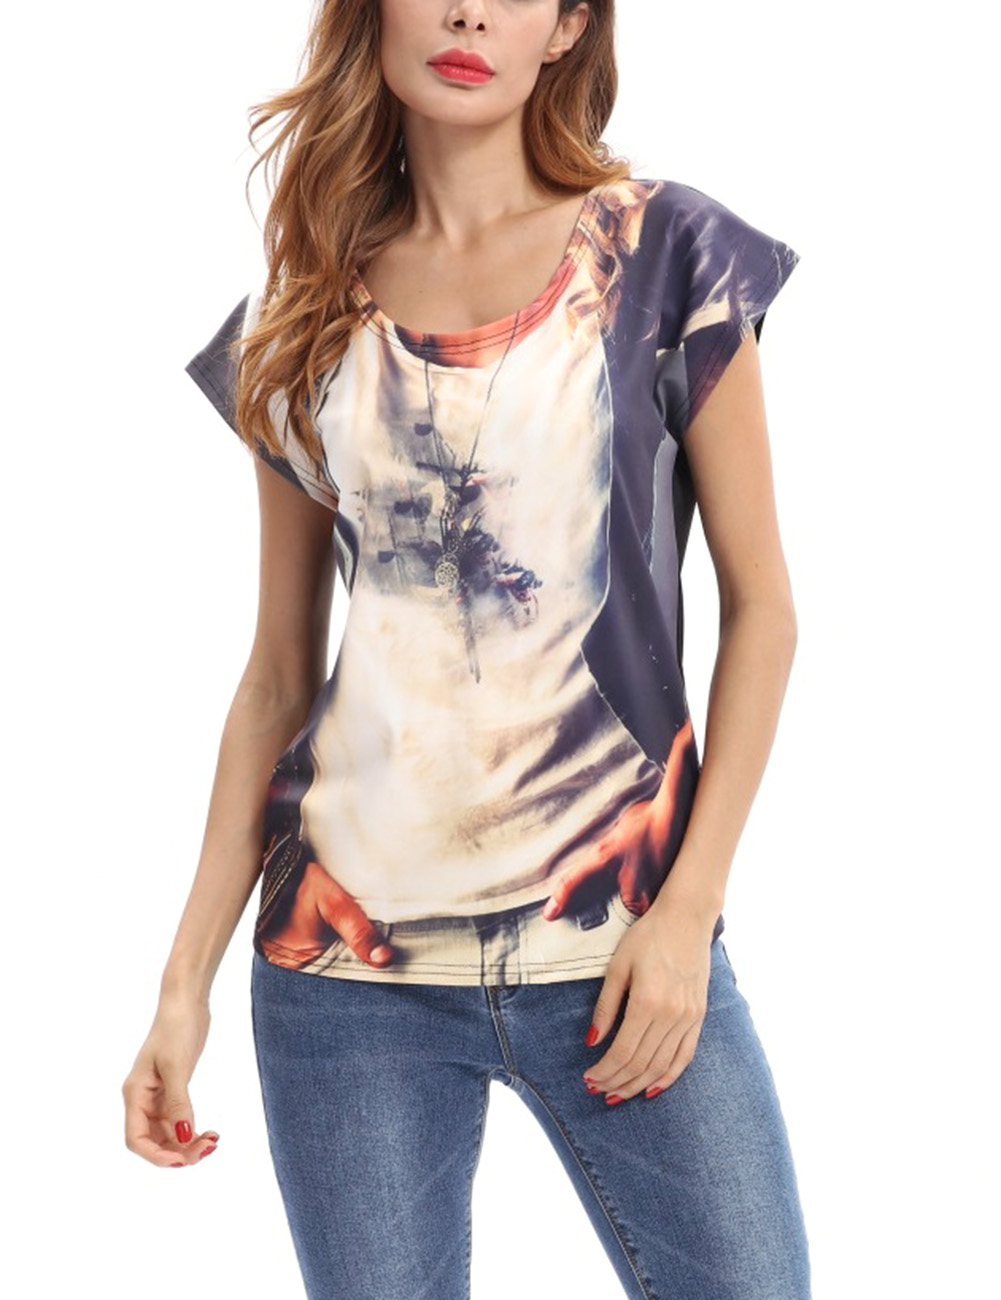 Women Stylish Short-Sleeve Round-neck T-Shirt Creative Printing Tops Blouse